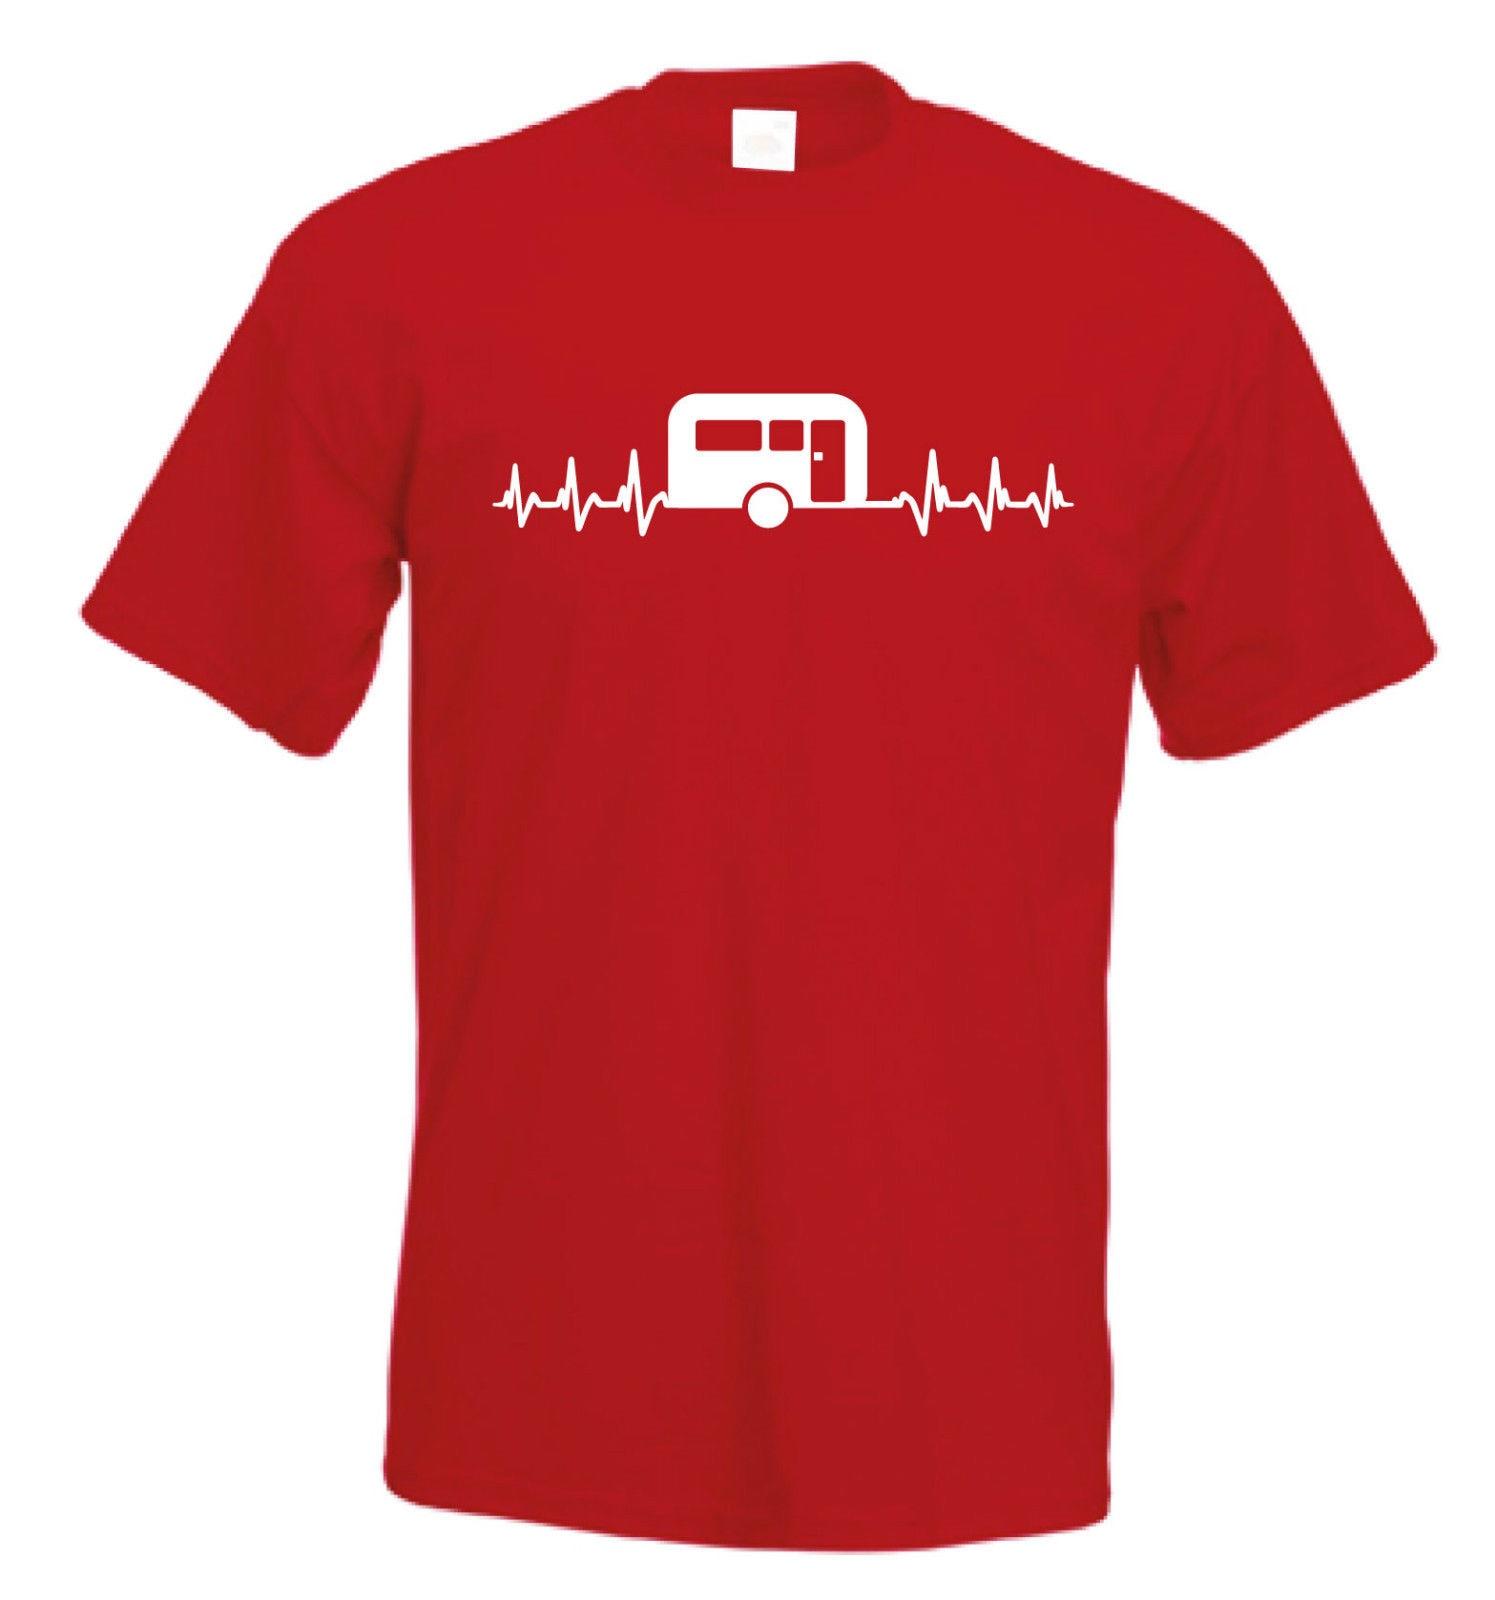 Its In My HeartBeat Caravanning T Shirt Campinger Caravan T-Shirt FREE UK P&P T-Shirt for Men/Boy Short Sleeve Cool Tees